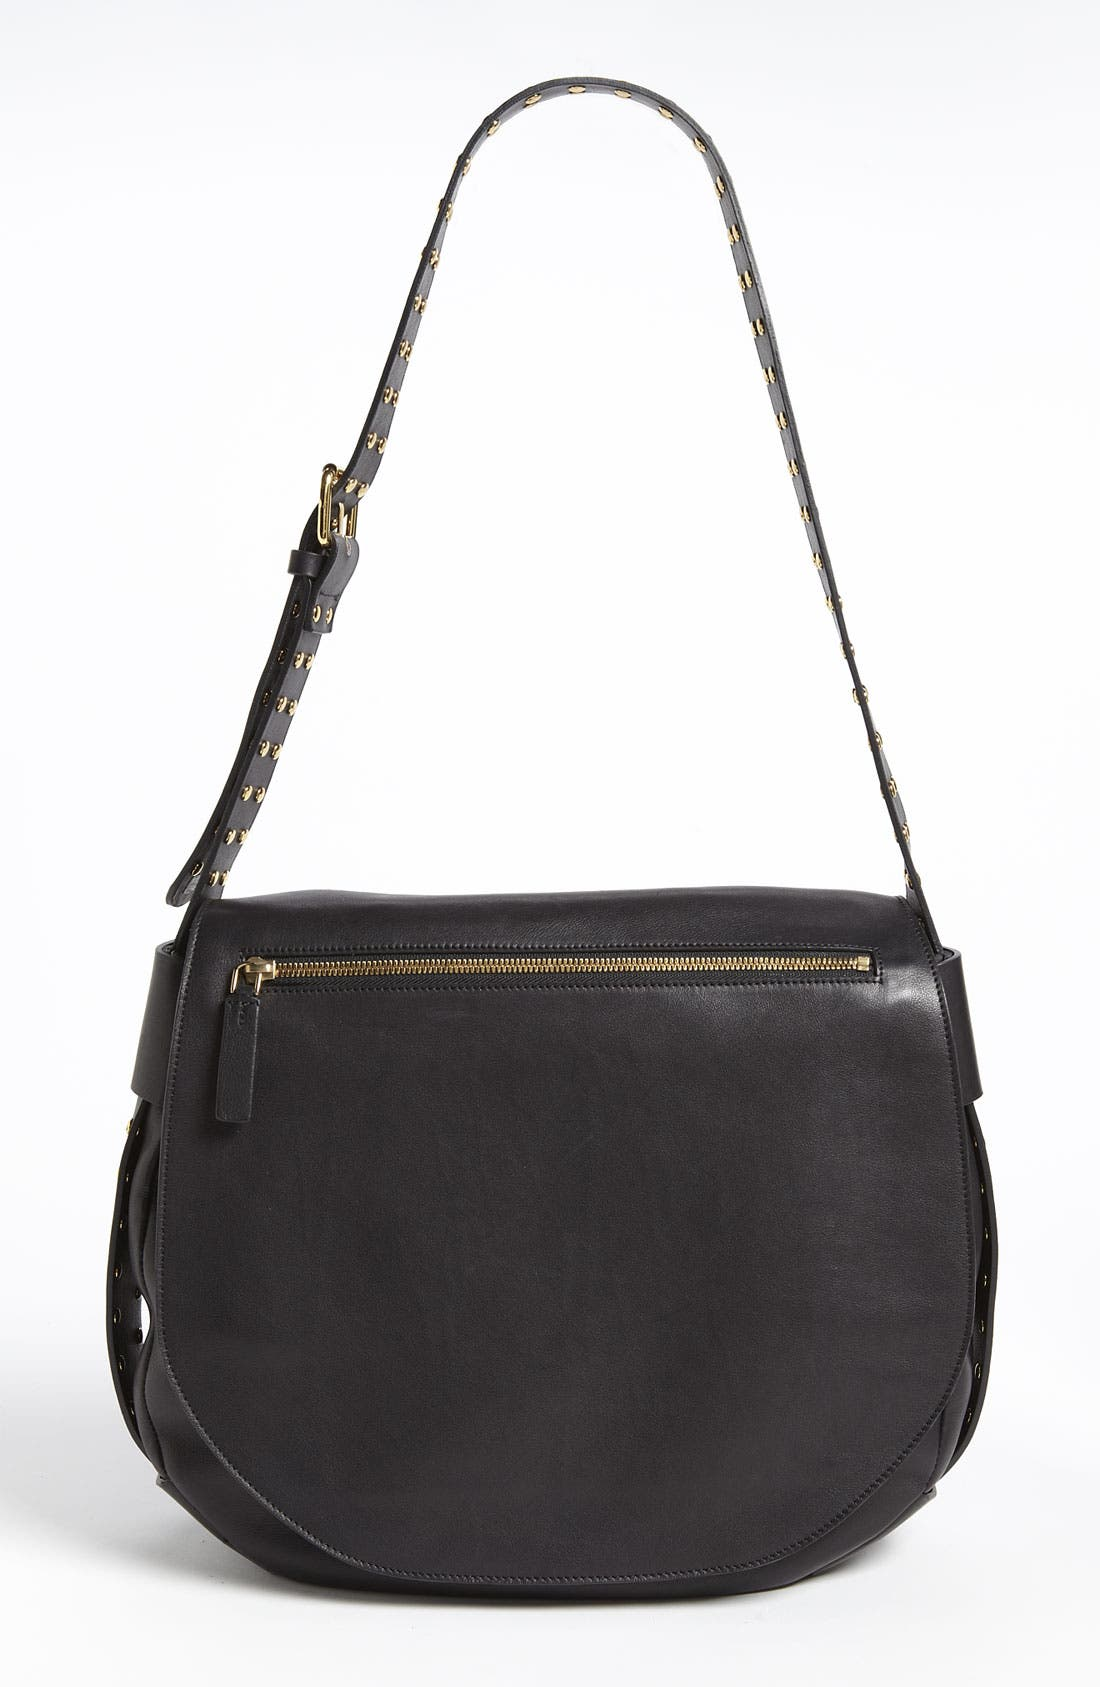 Main Image - Marni 'Large' Studded Crossbody Flap Bag